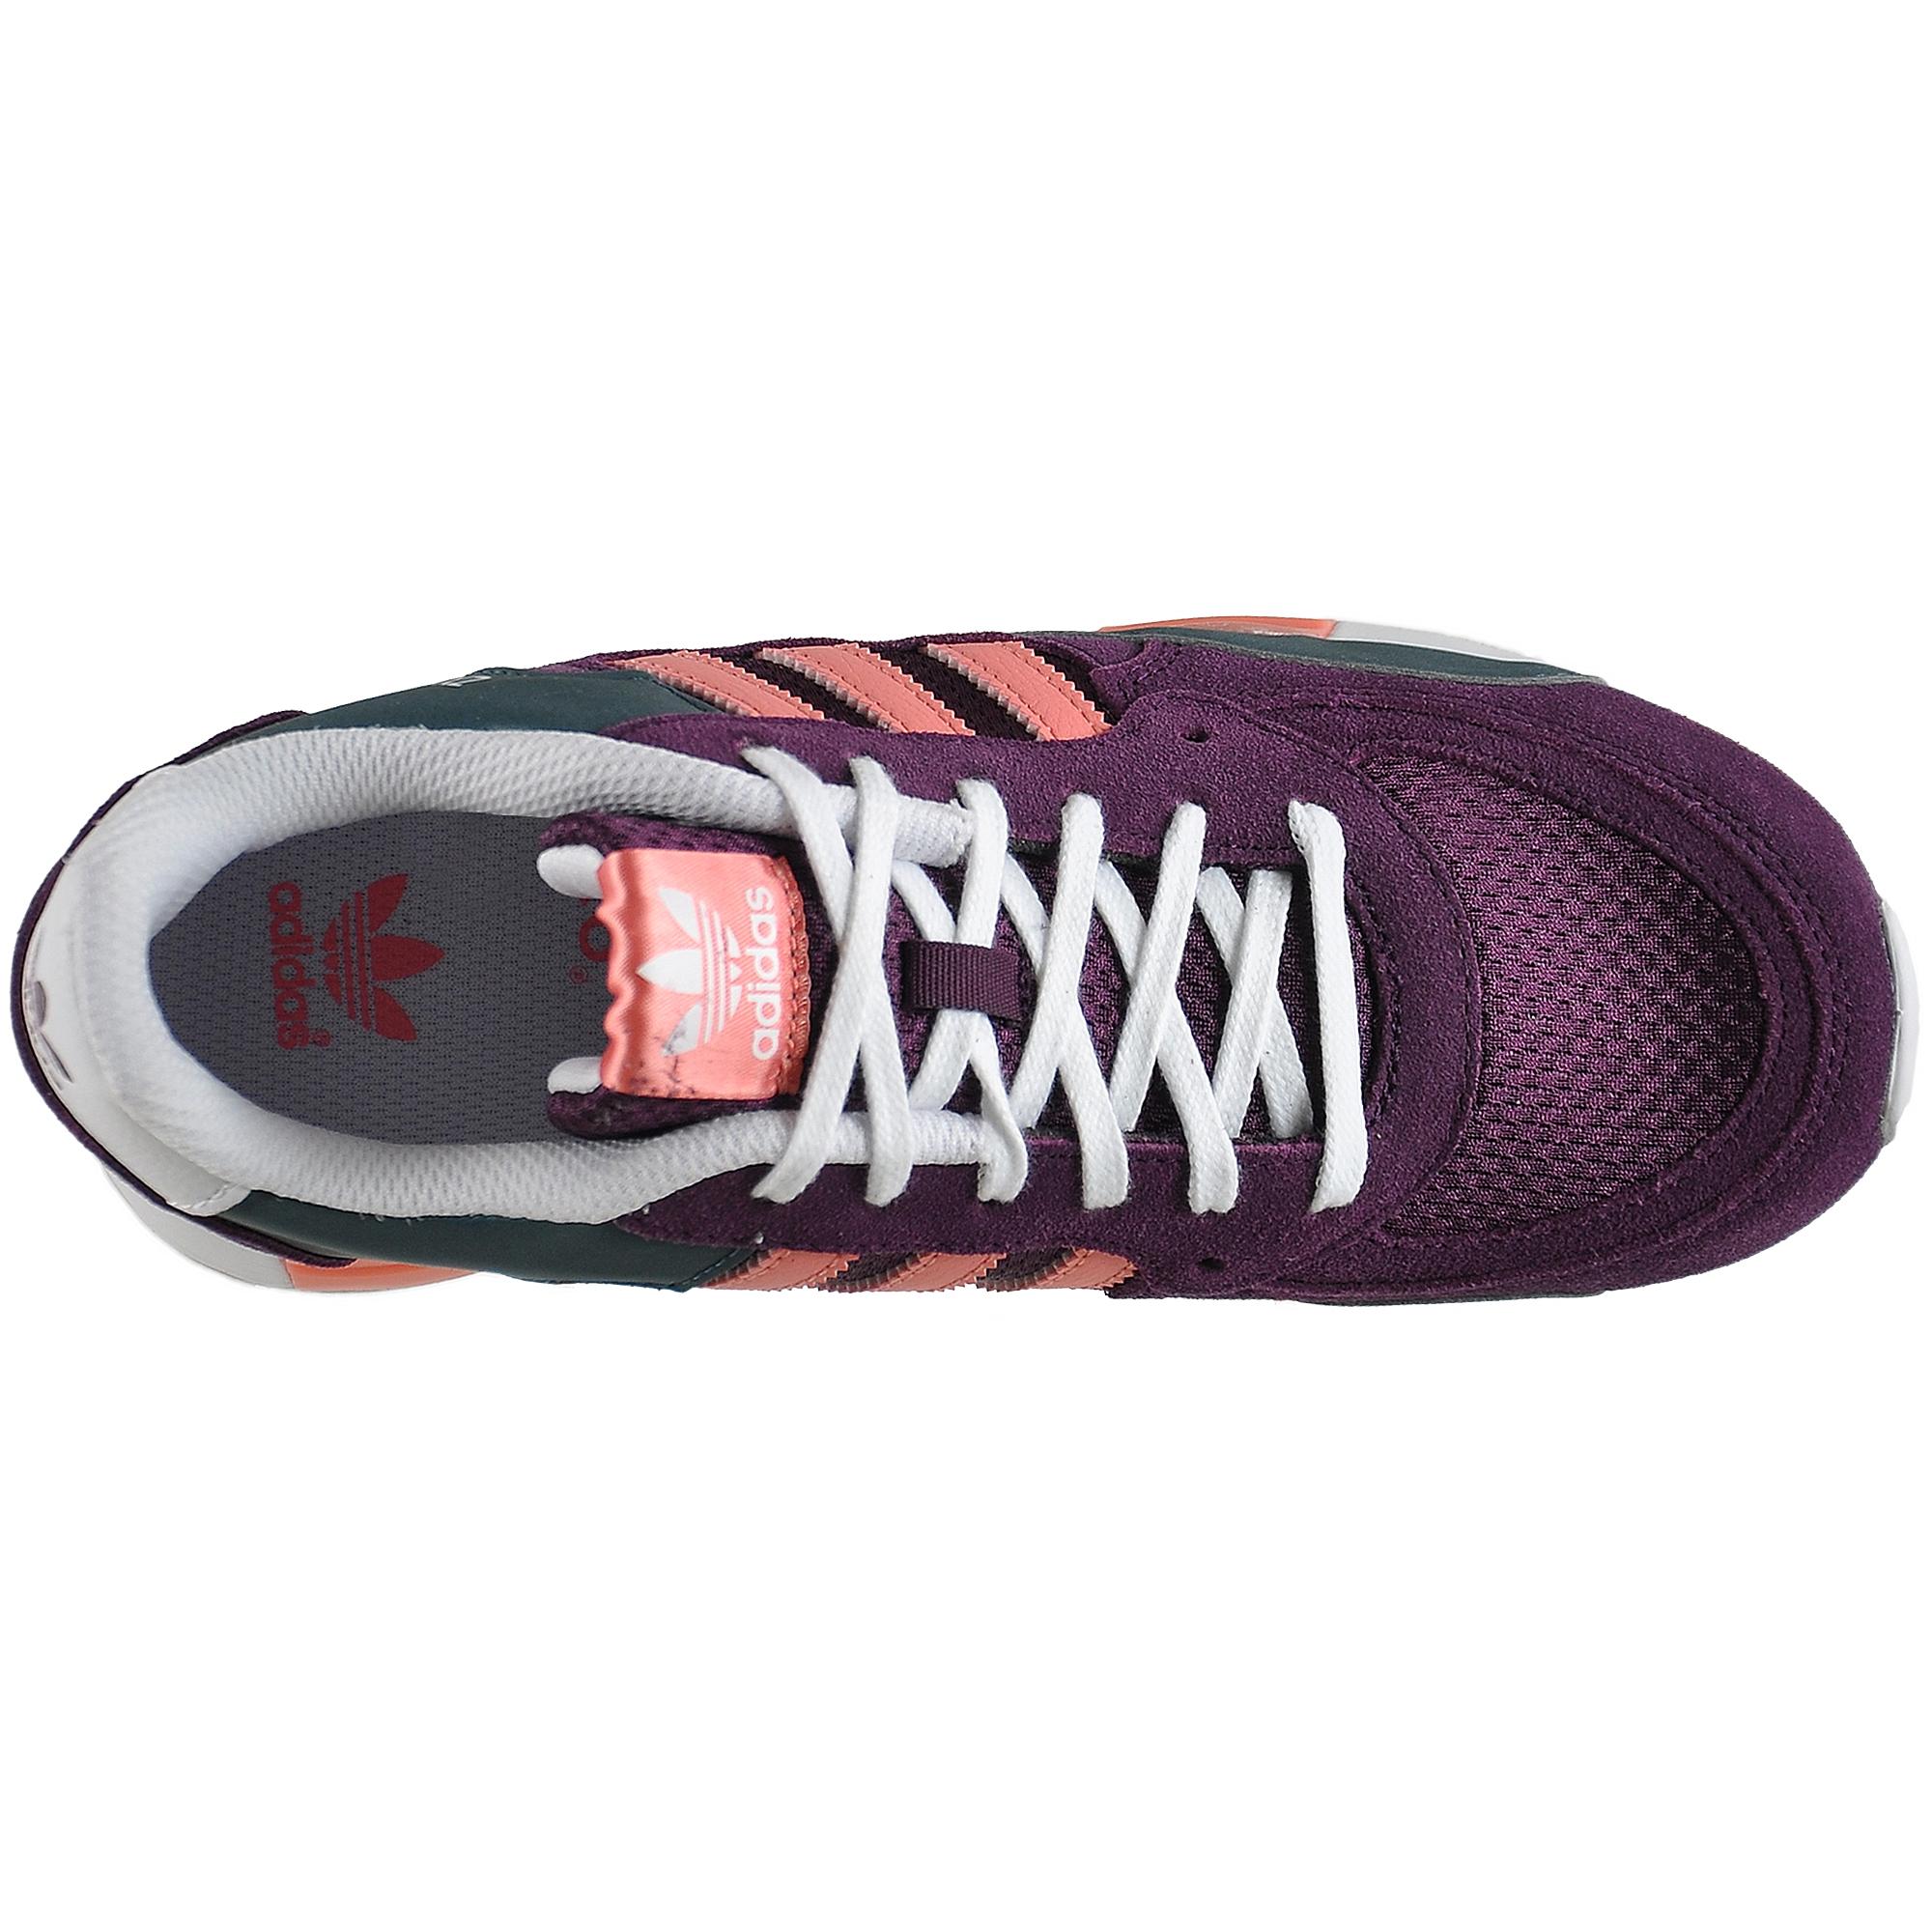 480550b489bf1 cheapest adidas zx 850 k b25563 20045 f3921